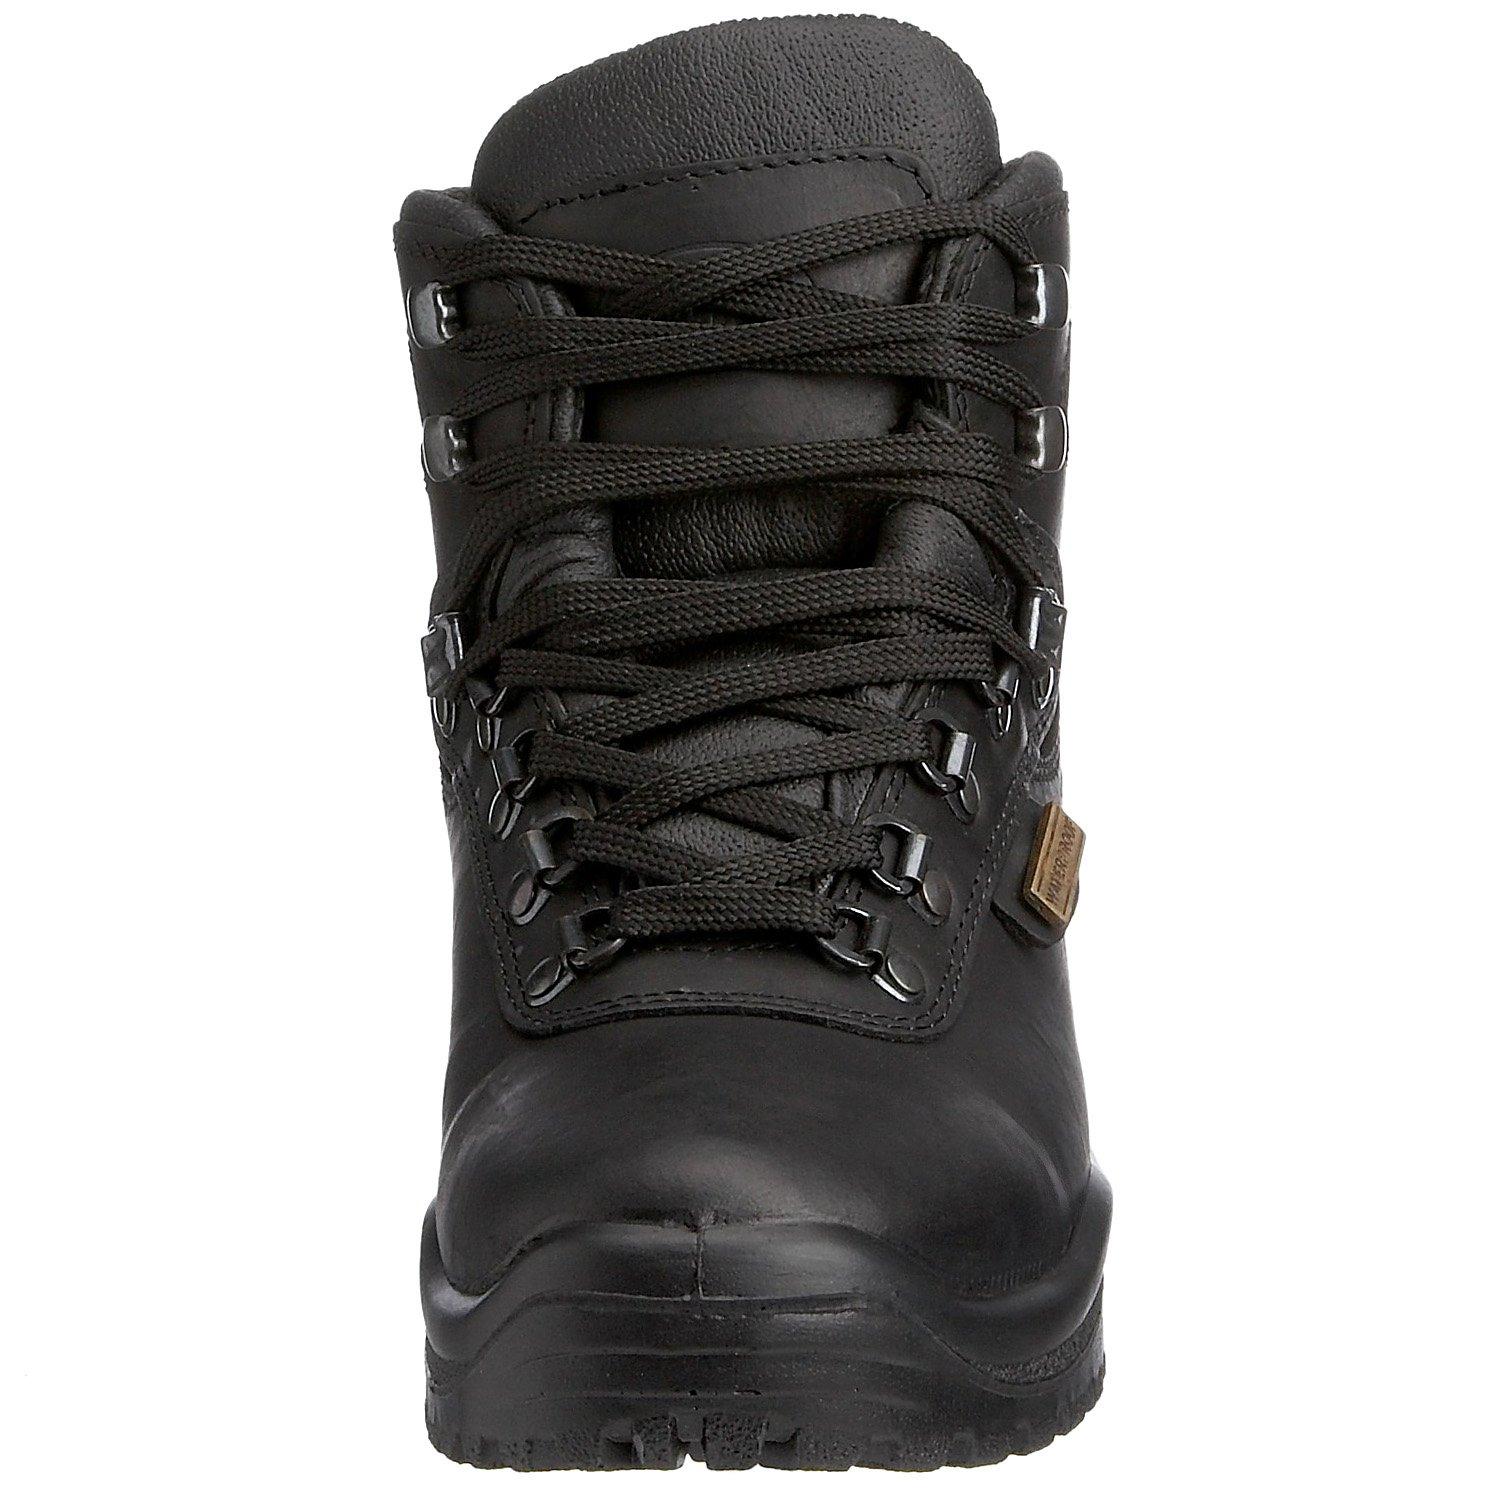 Grisport Women's Timber Hiking Boot Brown CMG513 5 UK DQZidq